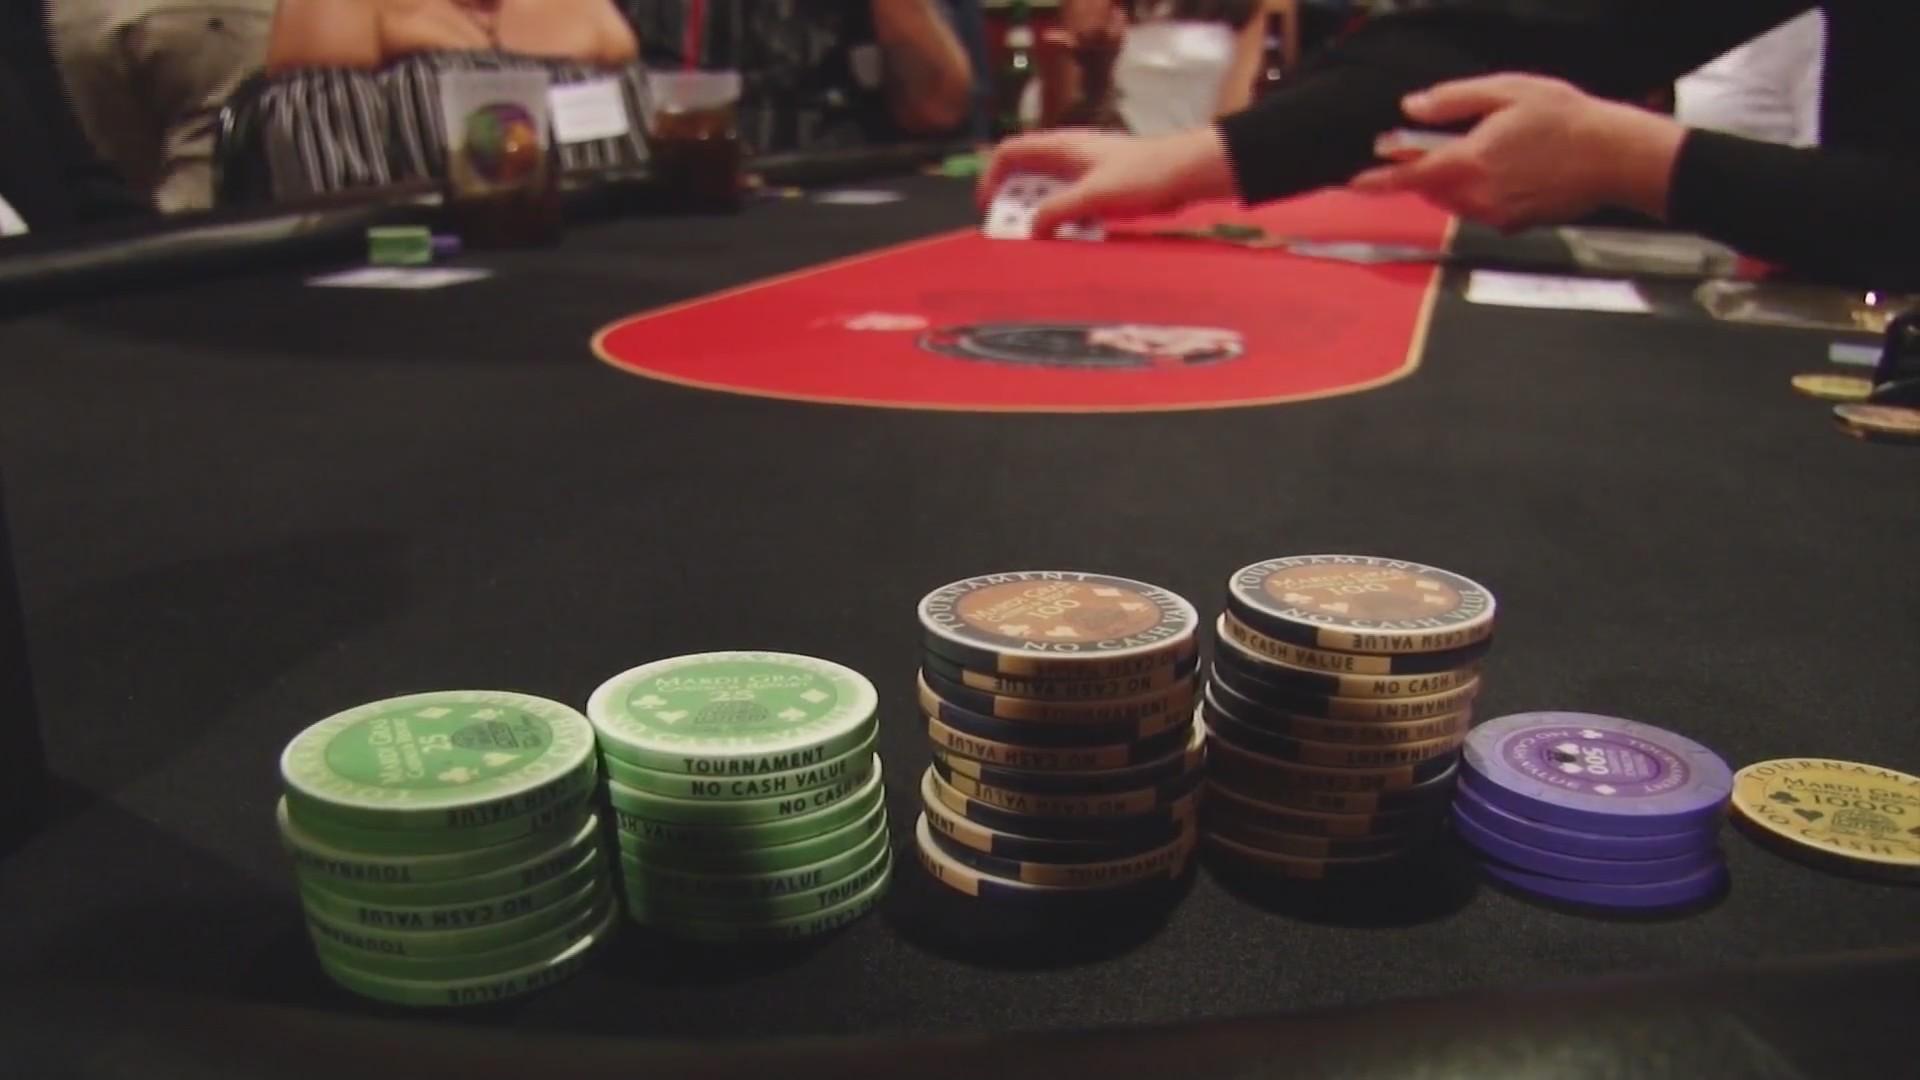 Casino expansion legislation awaits Governor Pritzker's signature